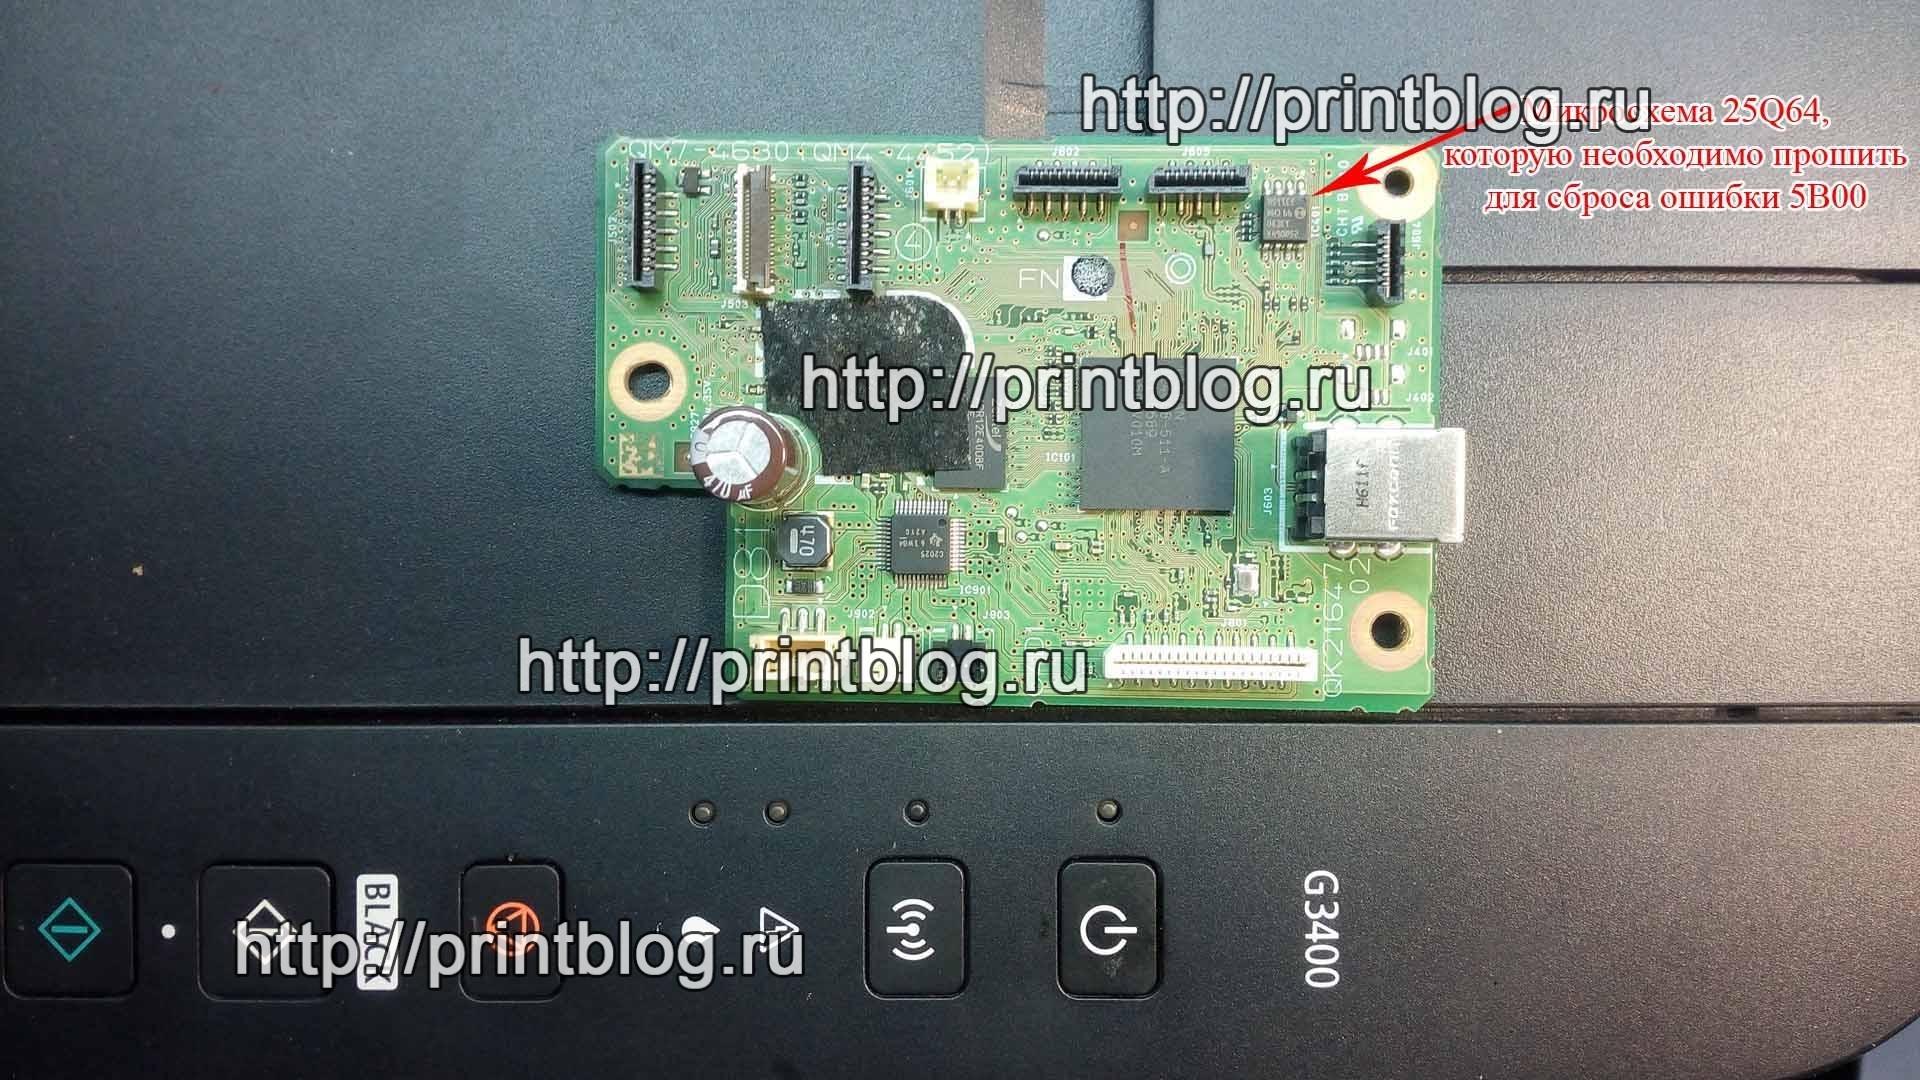 Canon Pixma G3400 Код поддержки: 5B00 (5В00). Сброс памперса